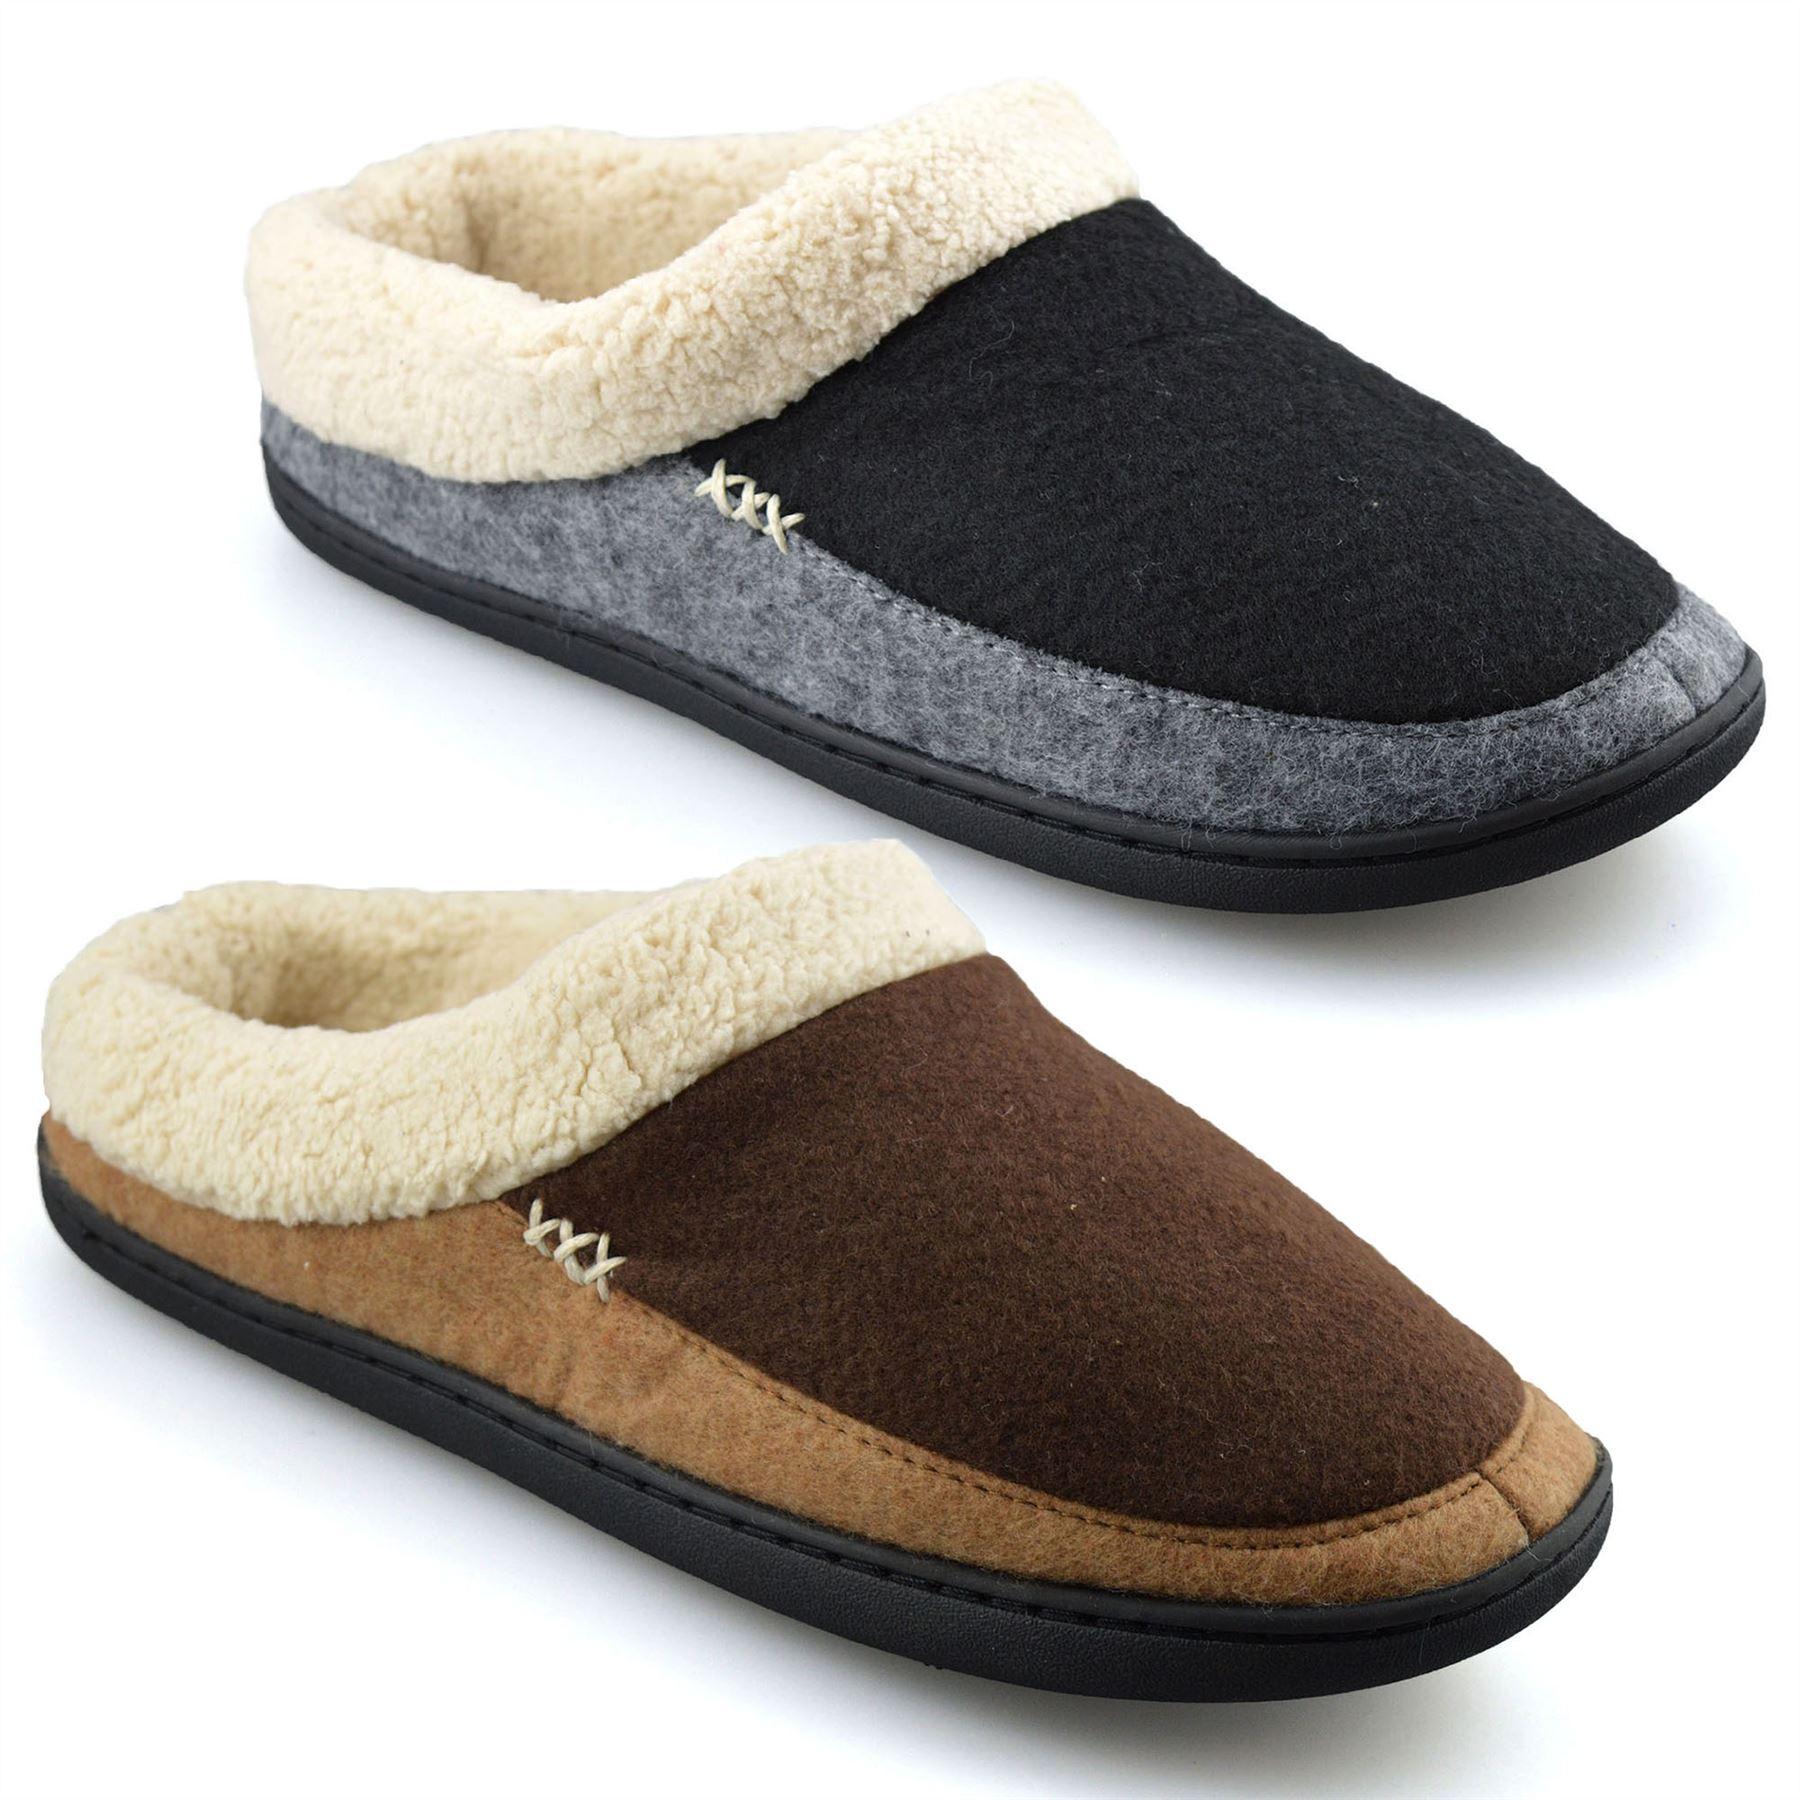 Details zu Mens Memory Foam Warm Faux Suede Fleece Slippers Slip On Clog Mules Shoes Size